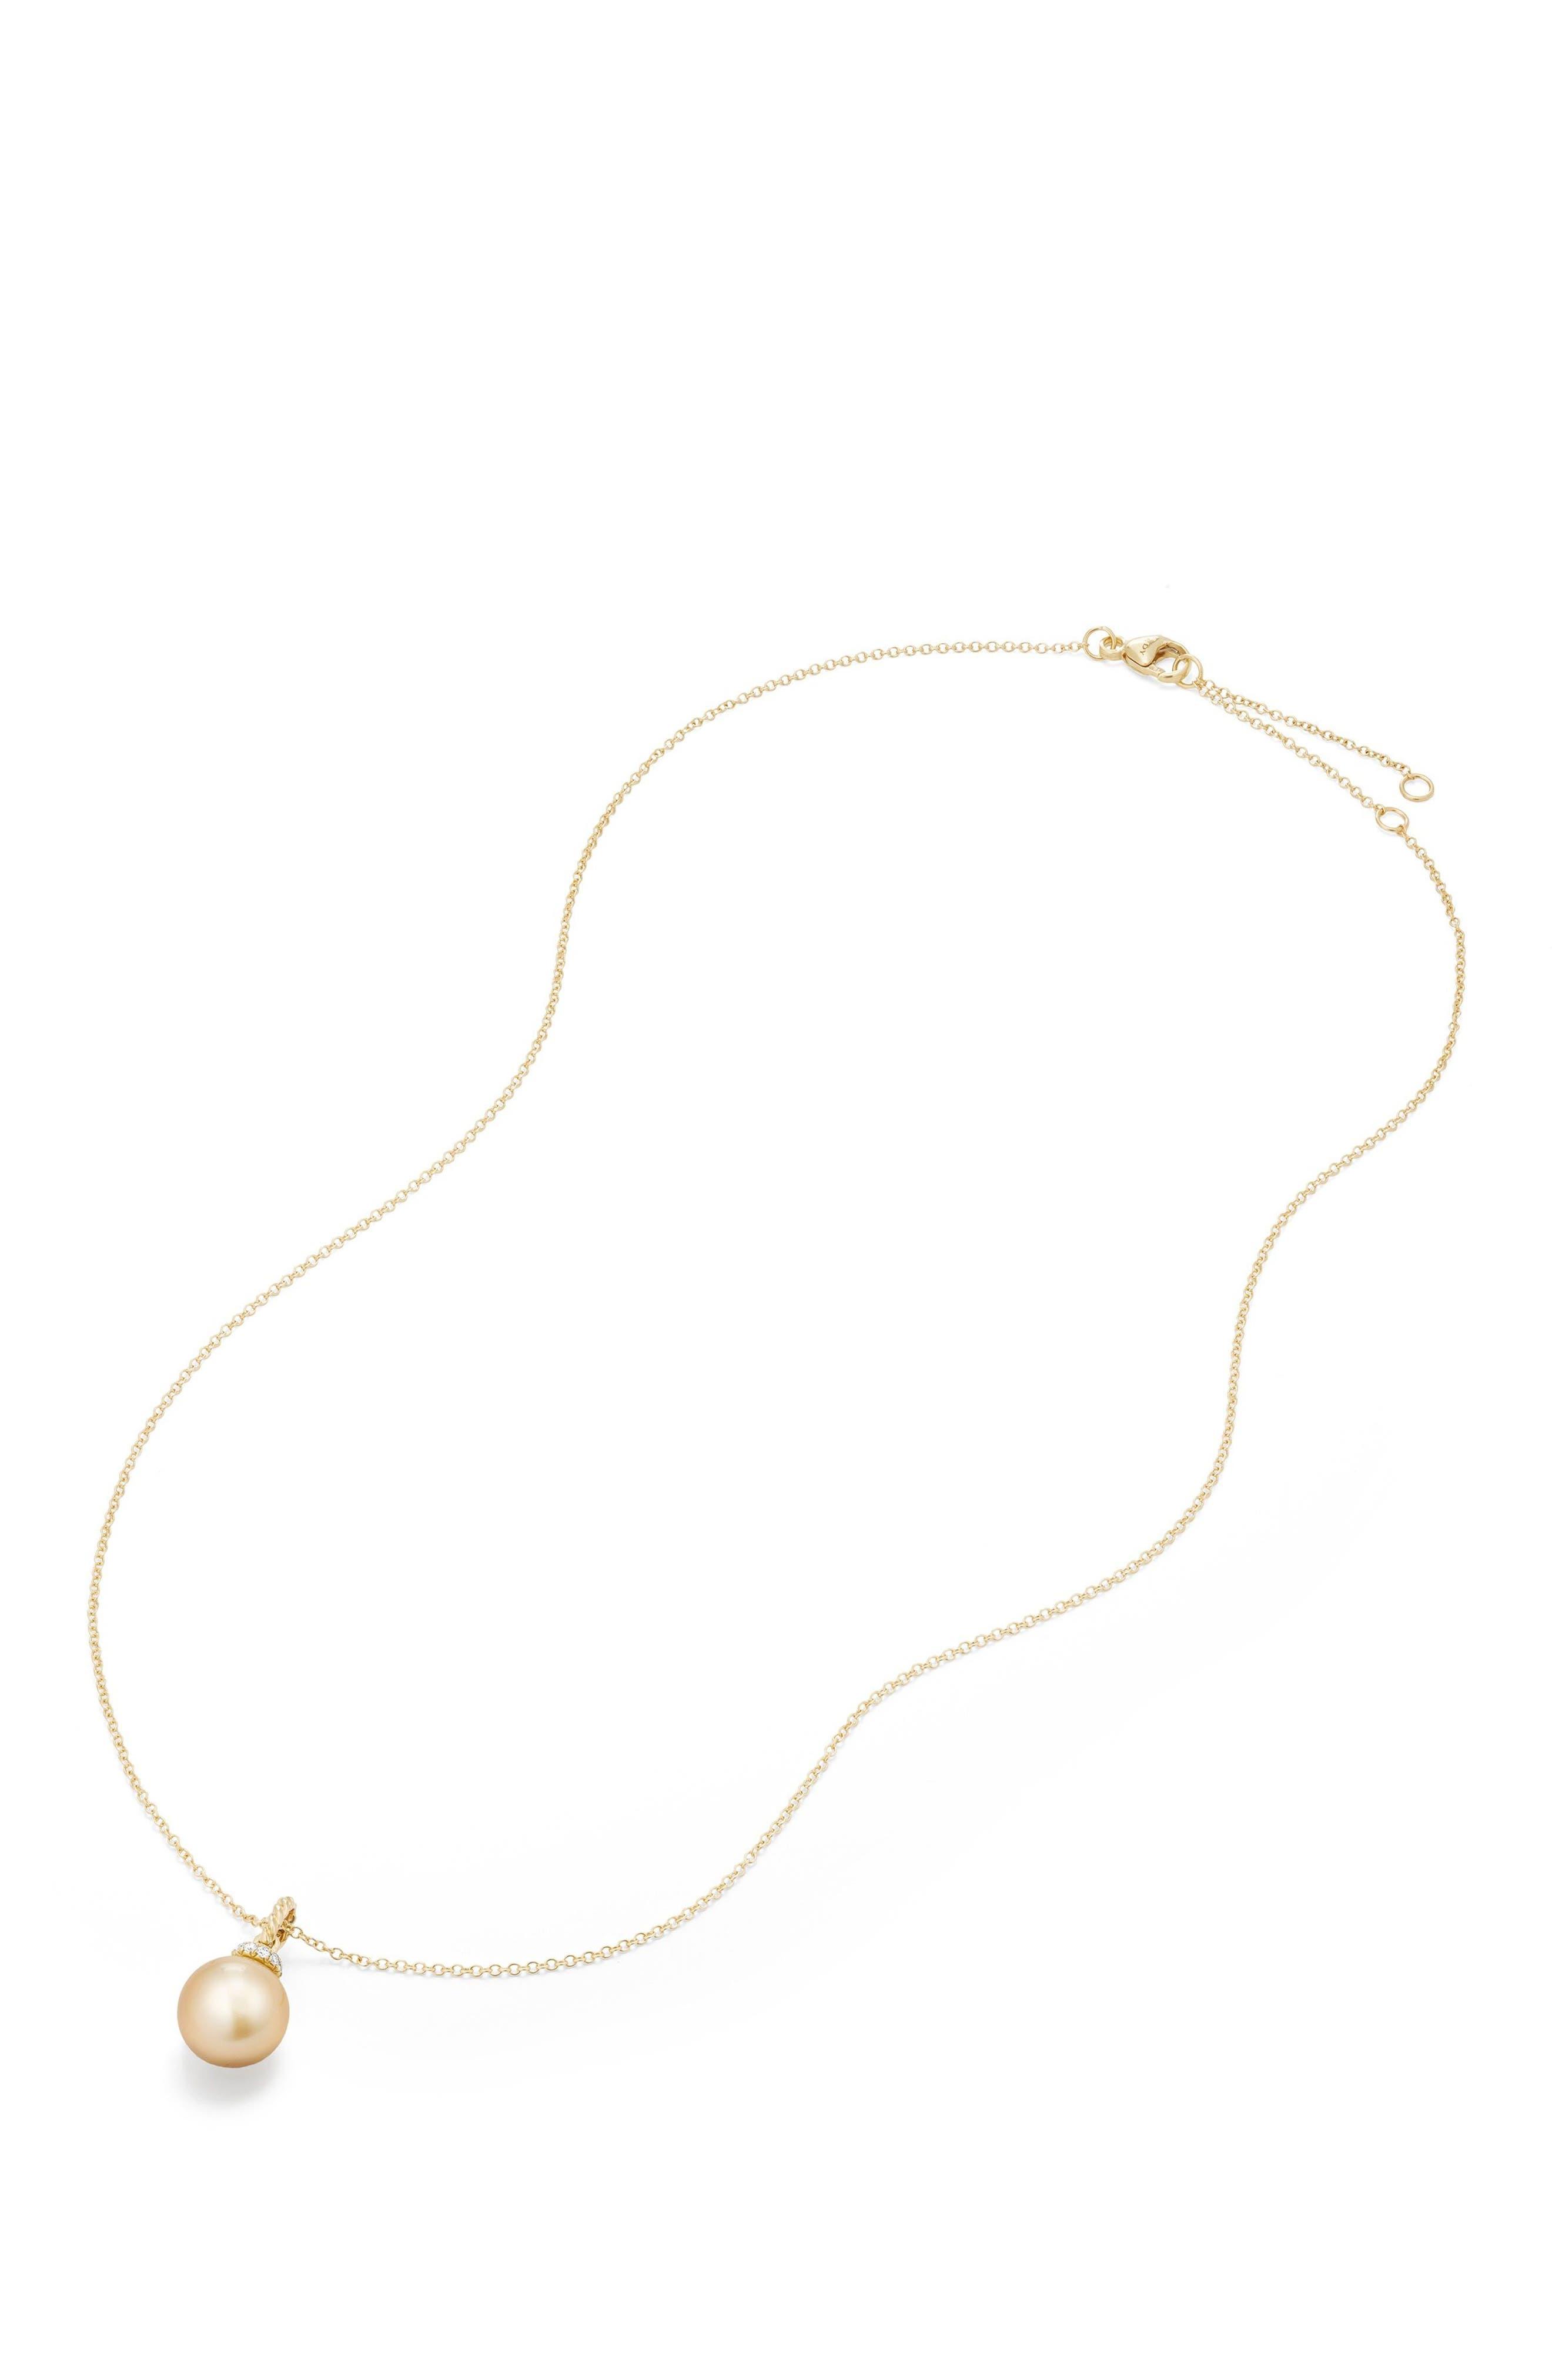 Solari Pendant Necklace with Diamonds,                             Alternate thumbnail 3, color,                             Gold/ Diamond/ Yellow Pearl